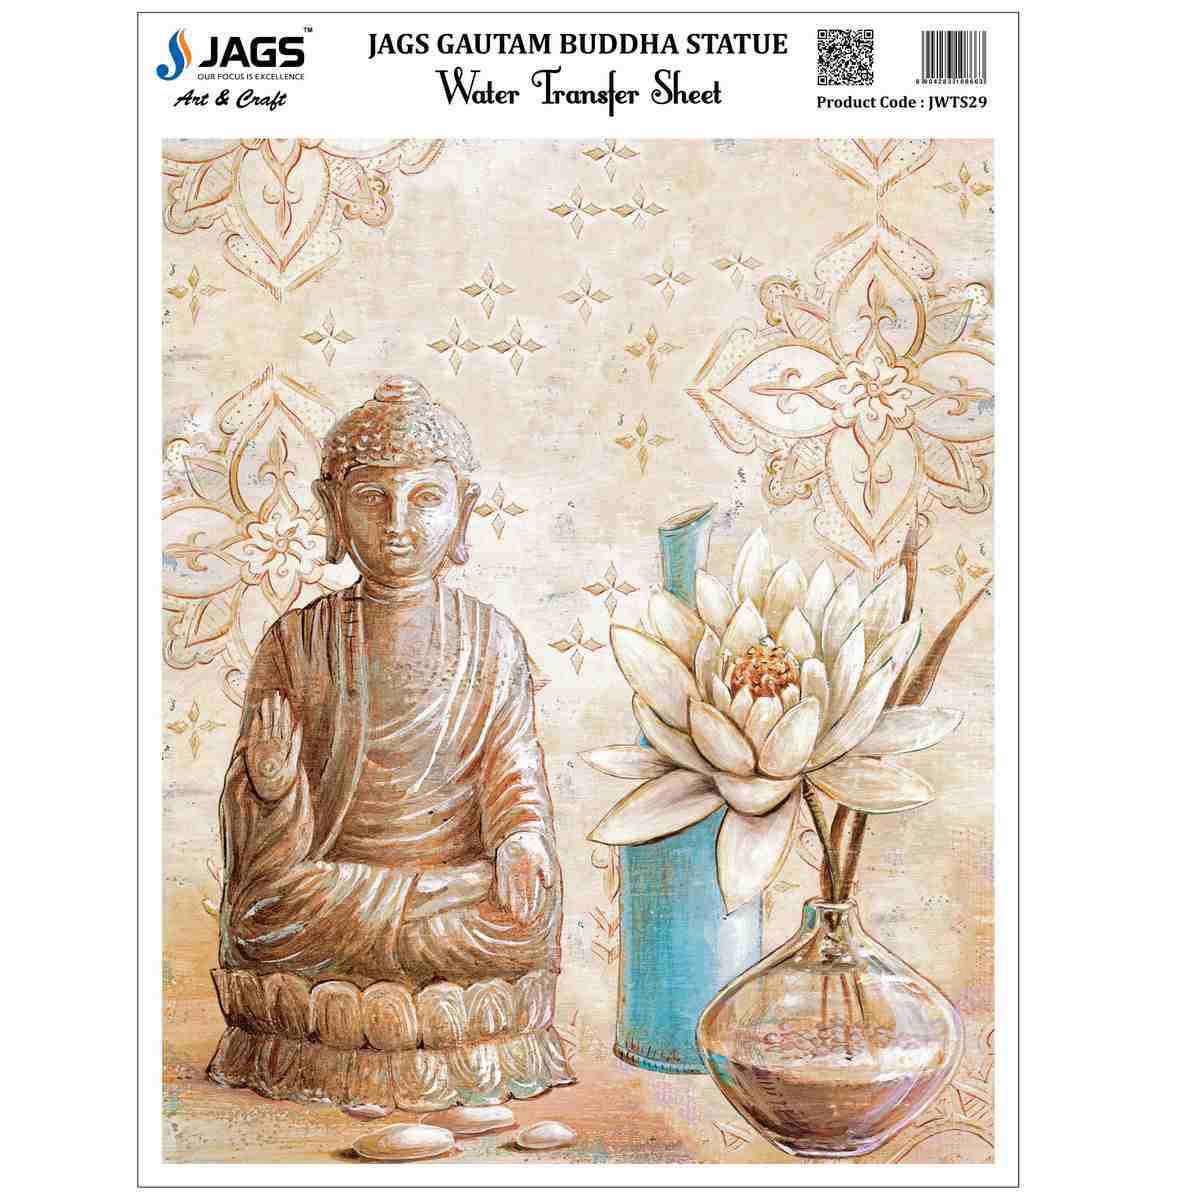 Water Transfer Sheet Gautam Buddha Statue Design